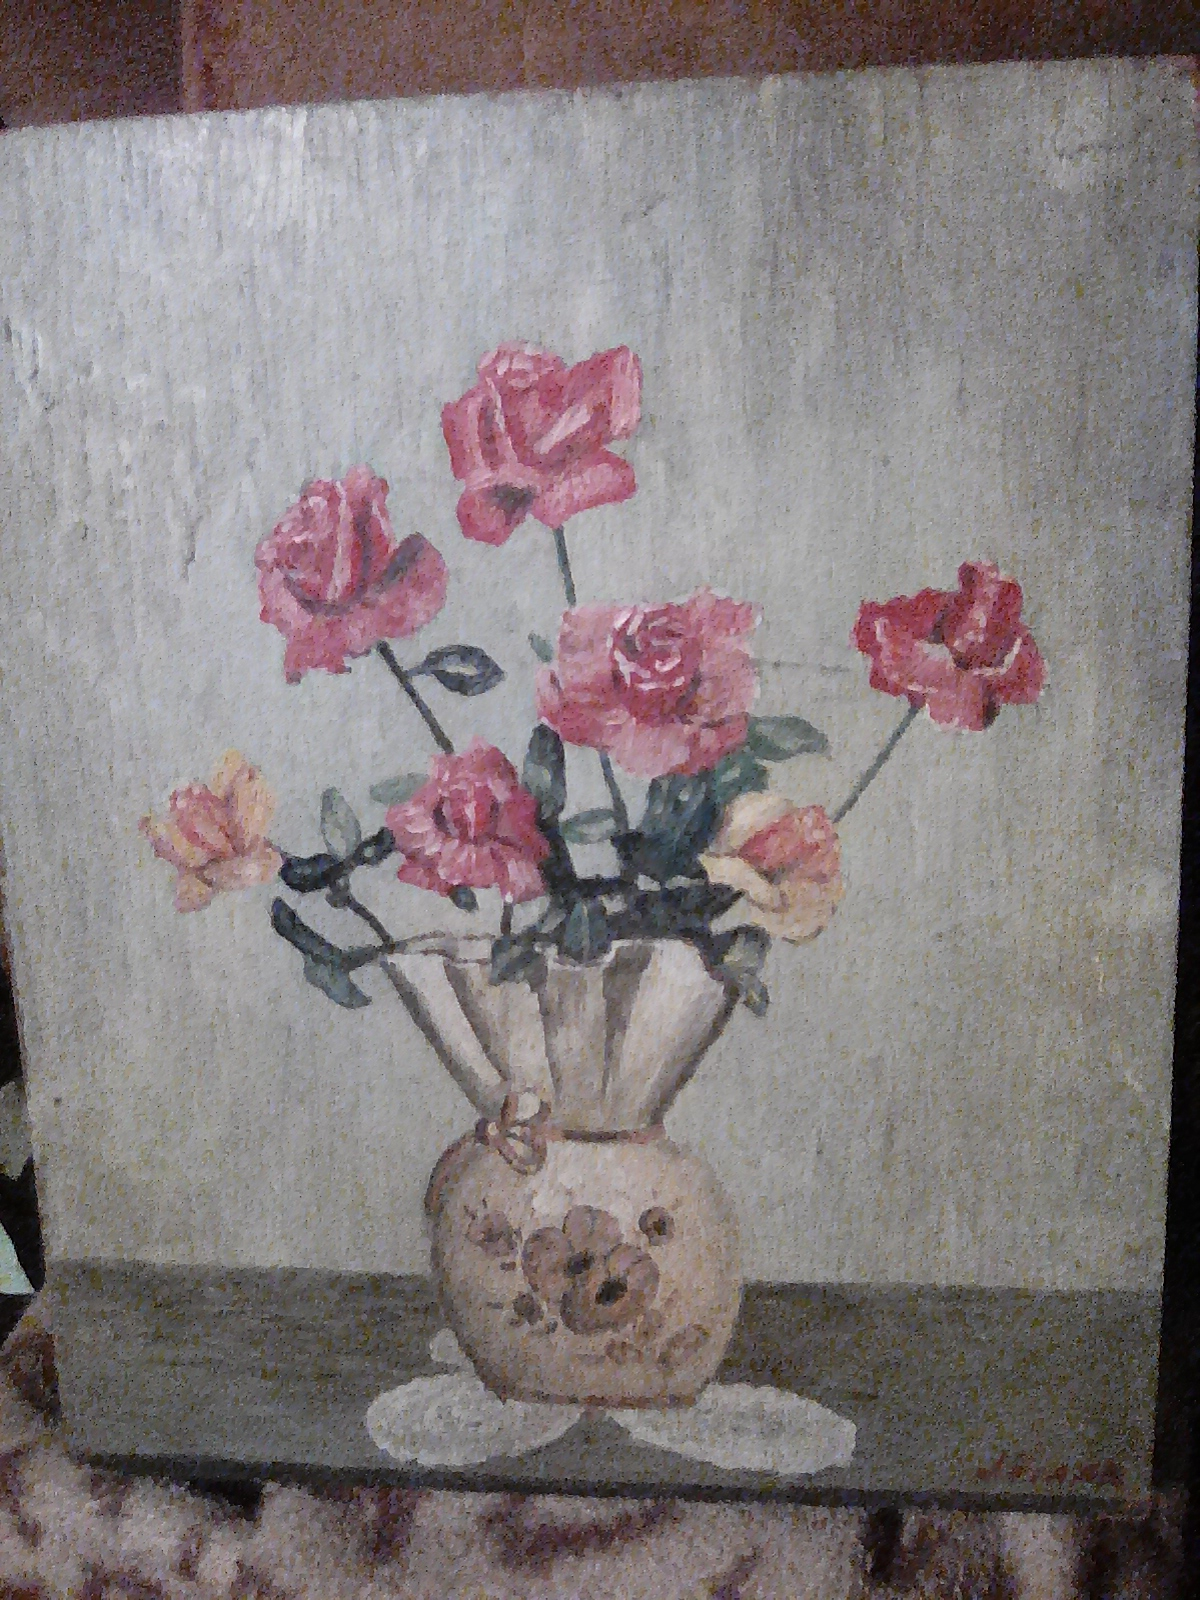 عمل فني قديم جدا لرسام عالمي j.viada للبيع /A very old art work by a global painter j.viada for sal